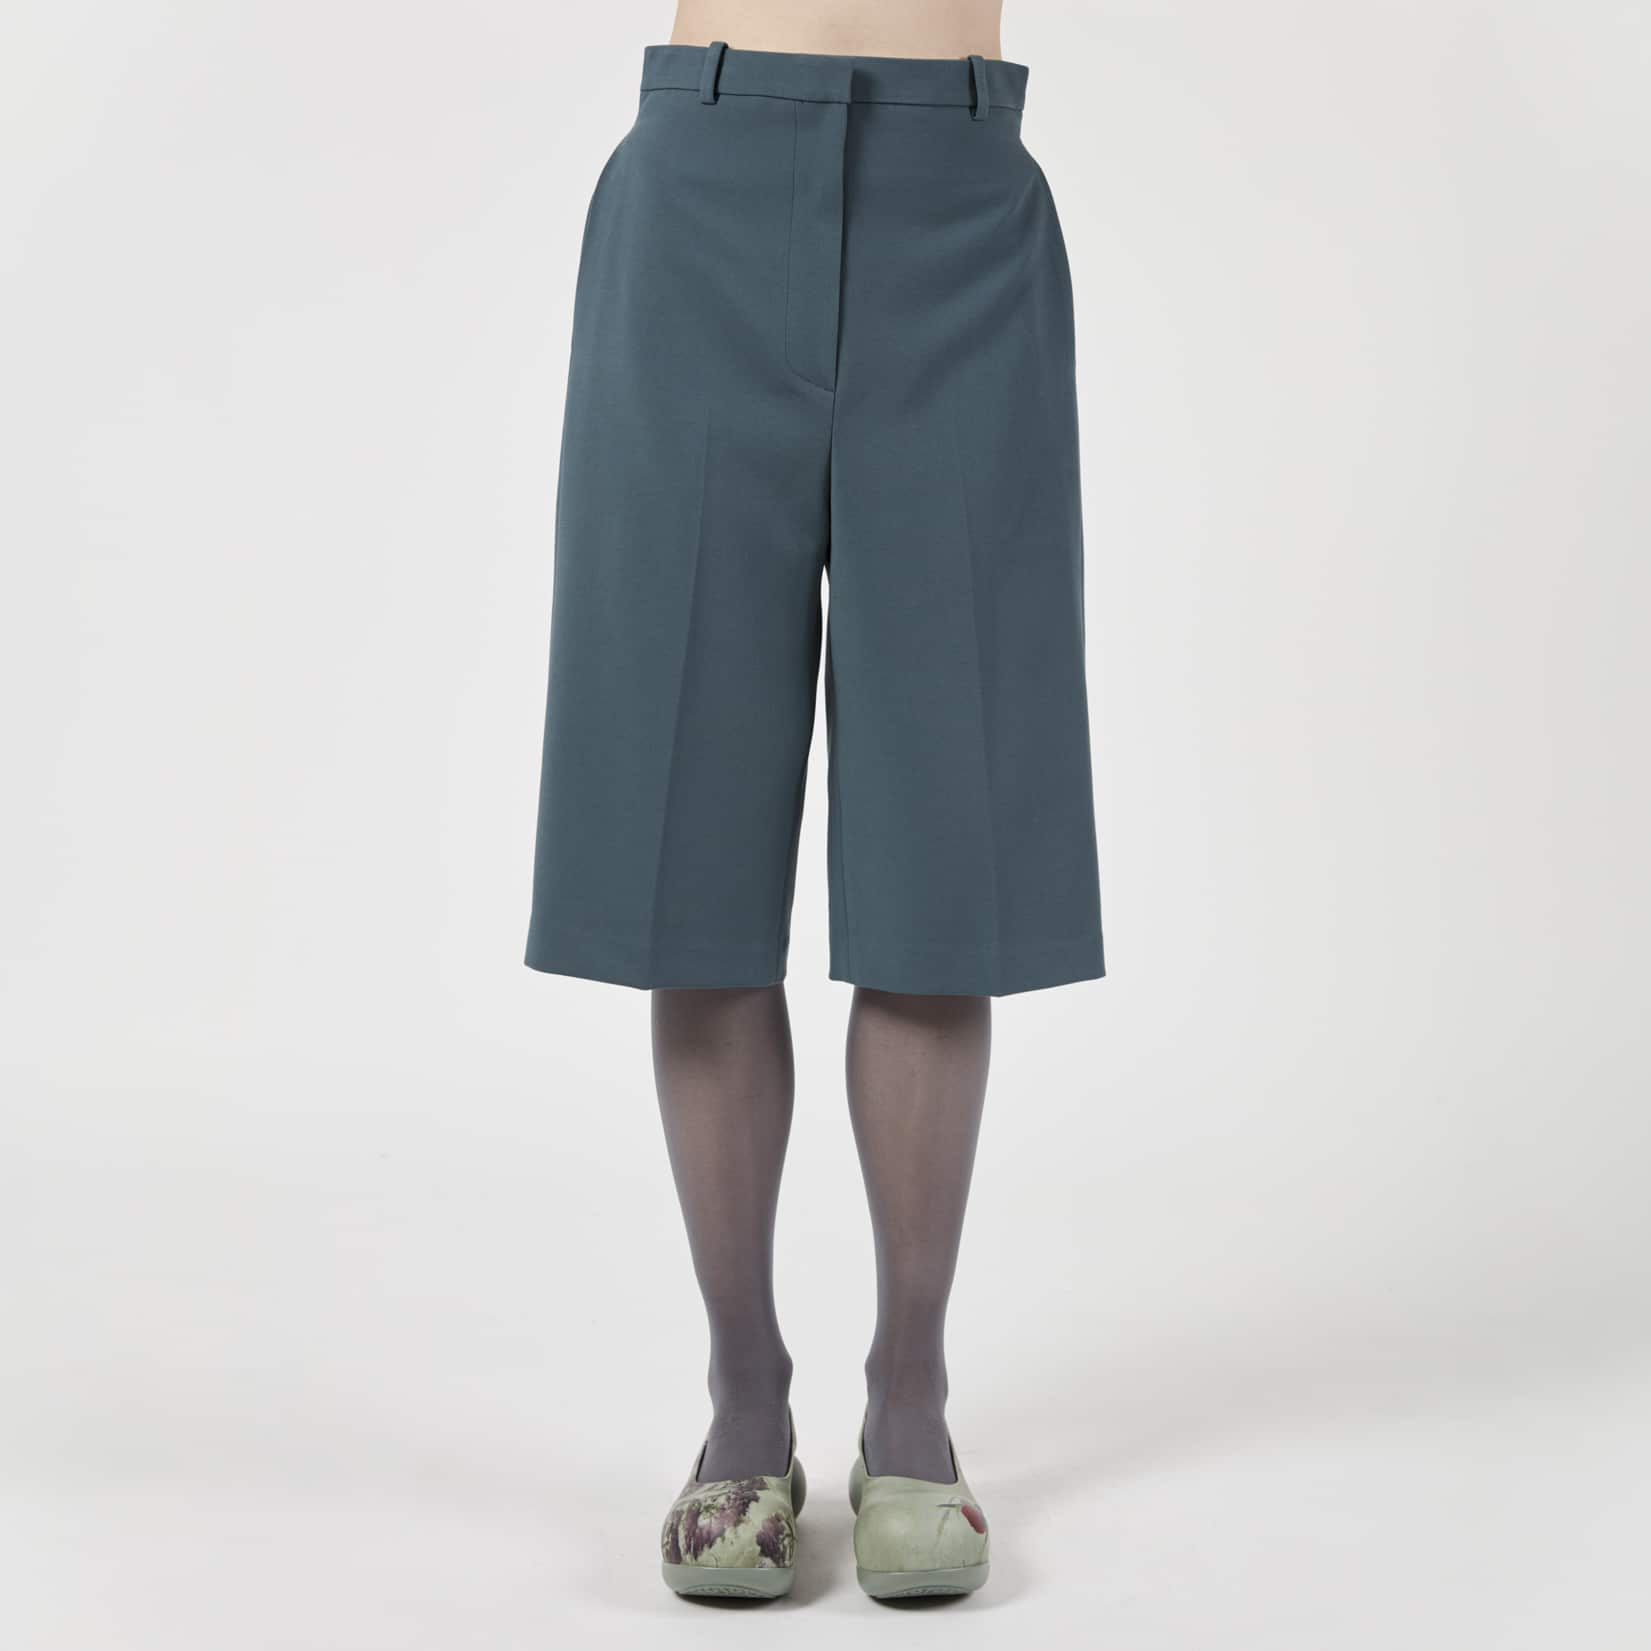 Pushbutton Tailored Bermuda Shorts